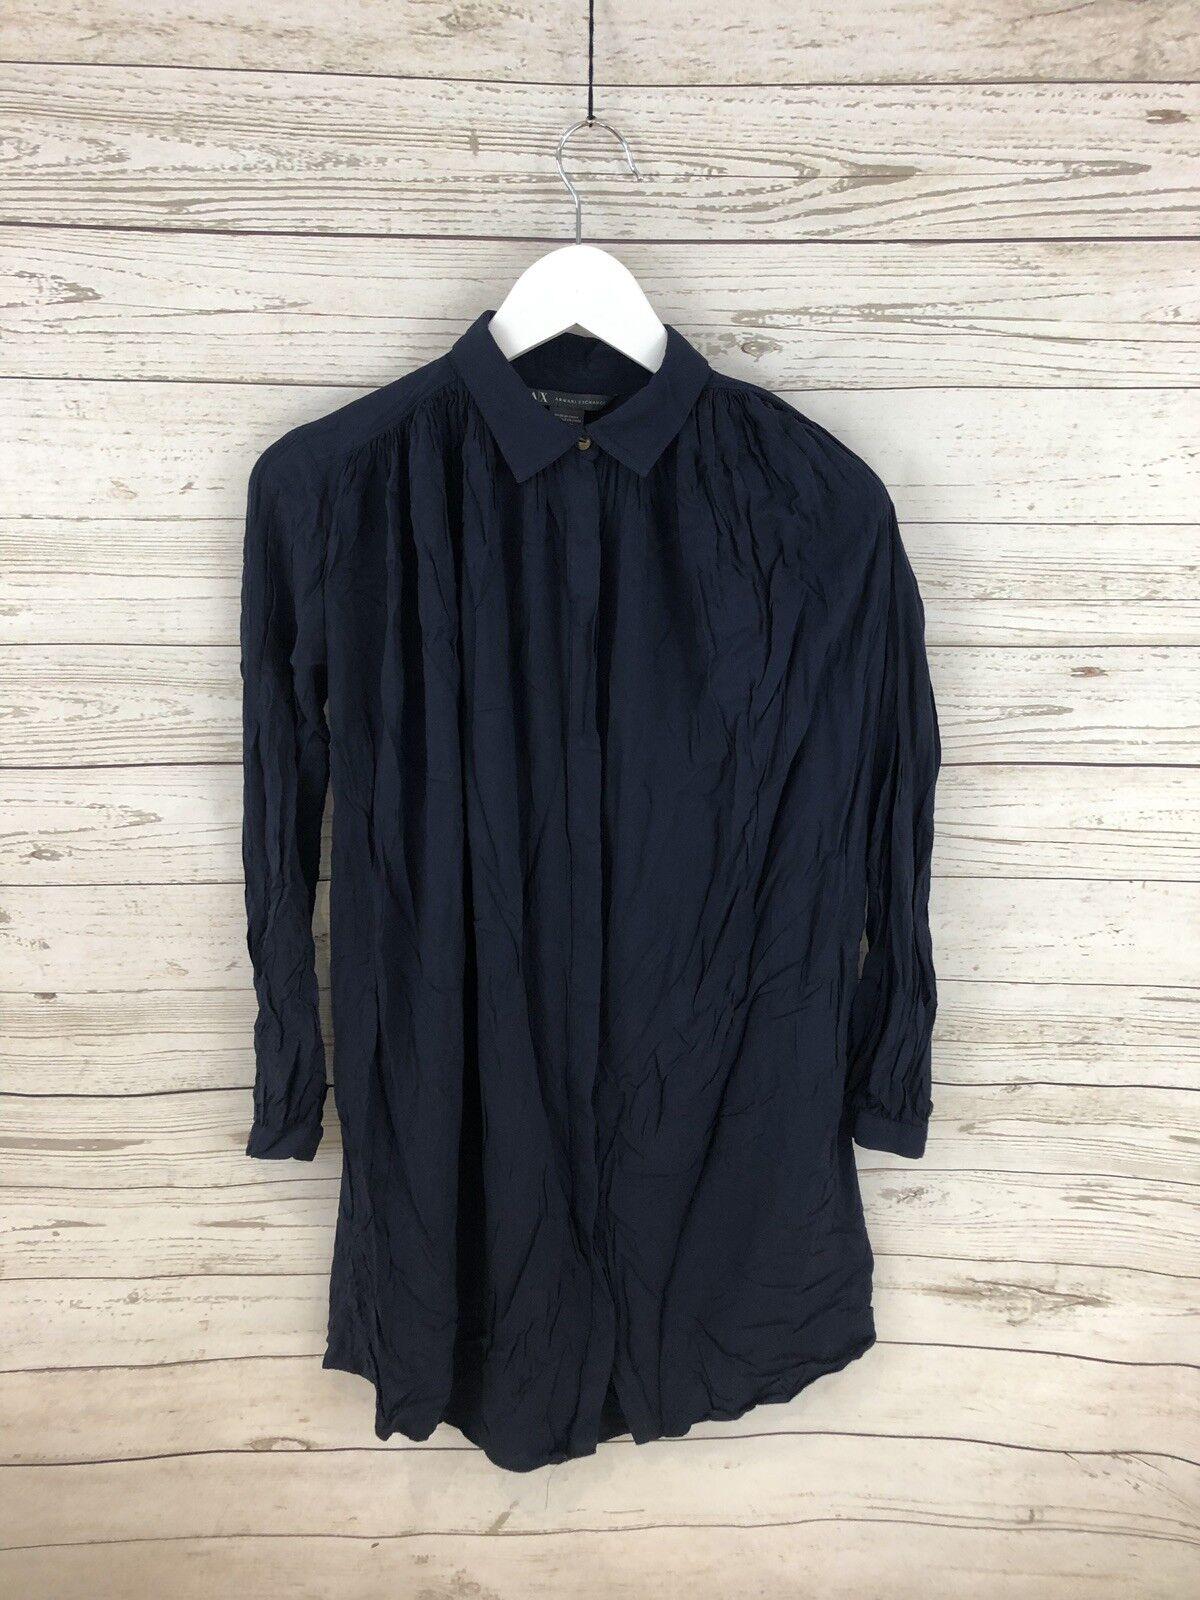 ARMANI Dress - Size XXS - Navy - Great Condition - Women's